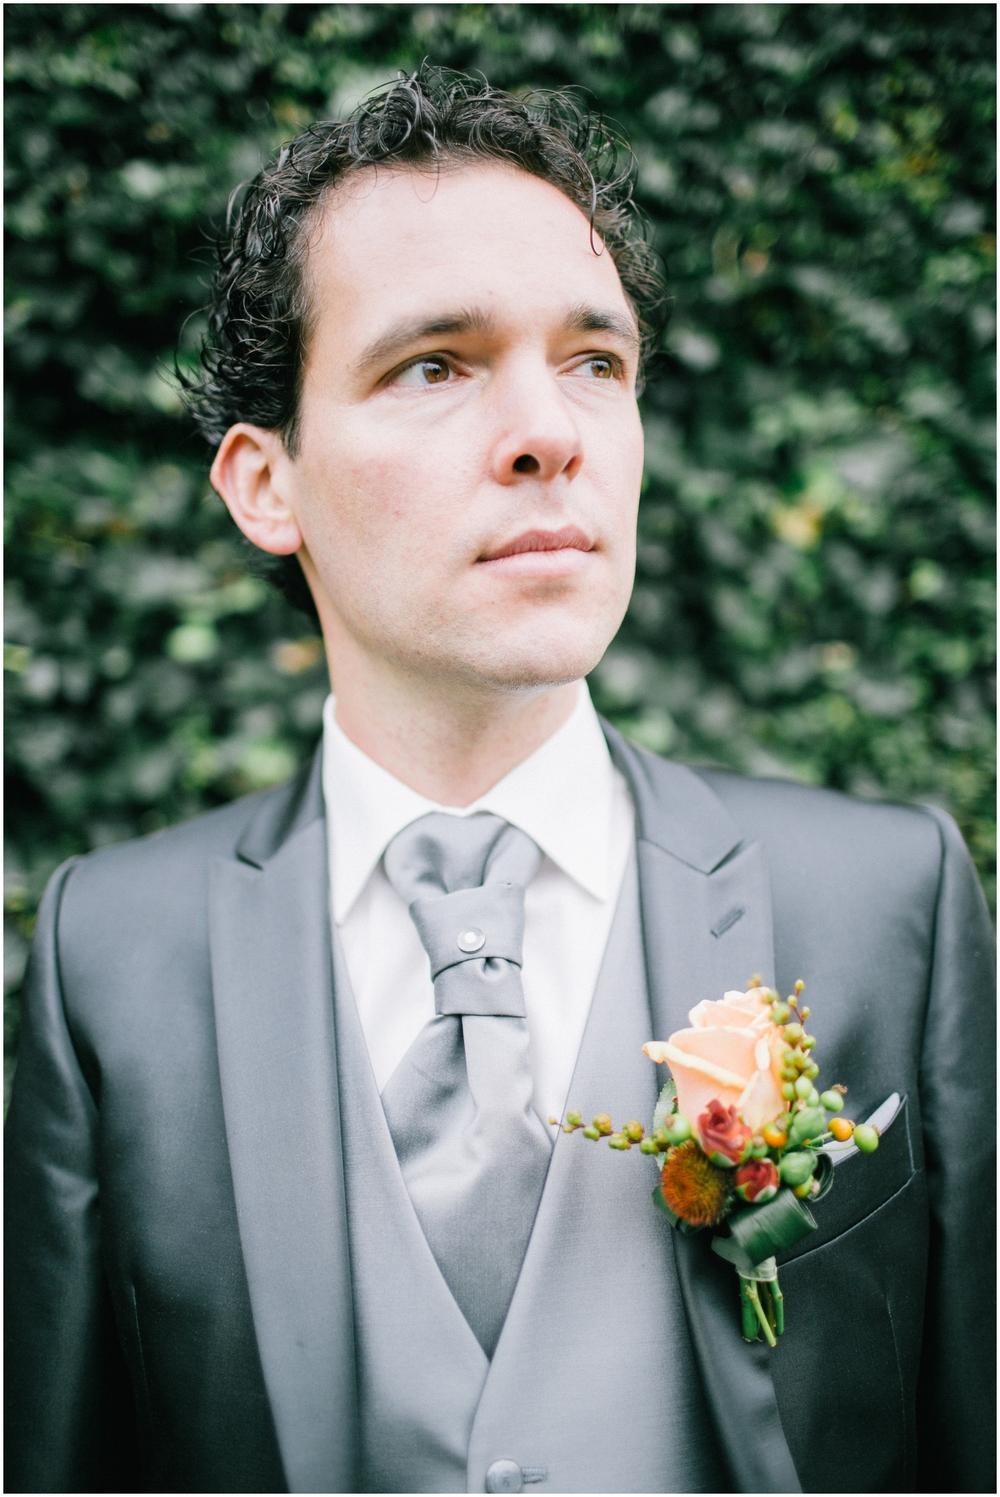 huwelijksfotograaf-hulst-nederland-014.jpg